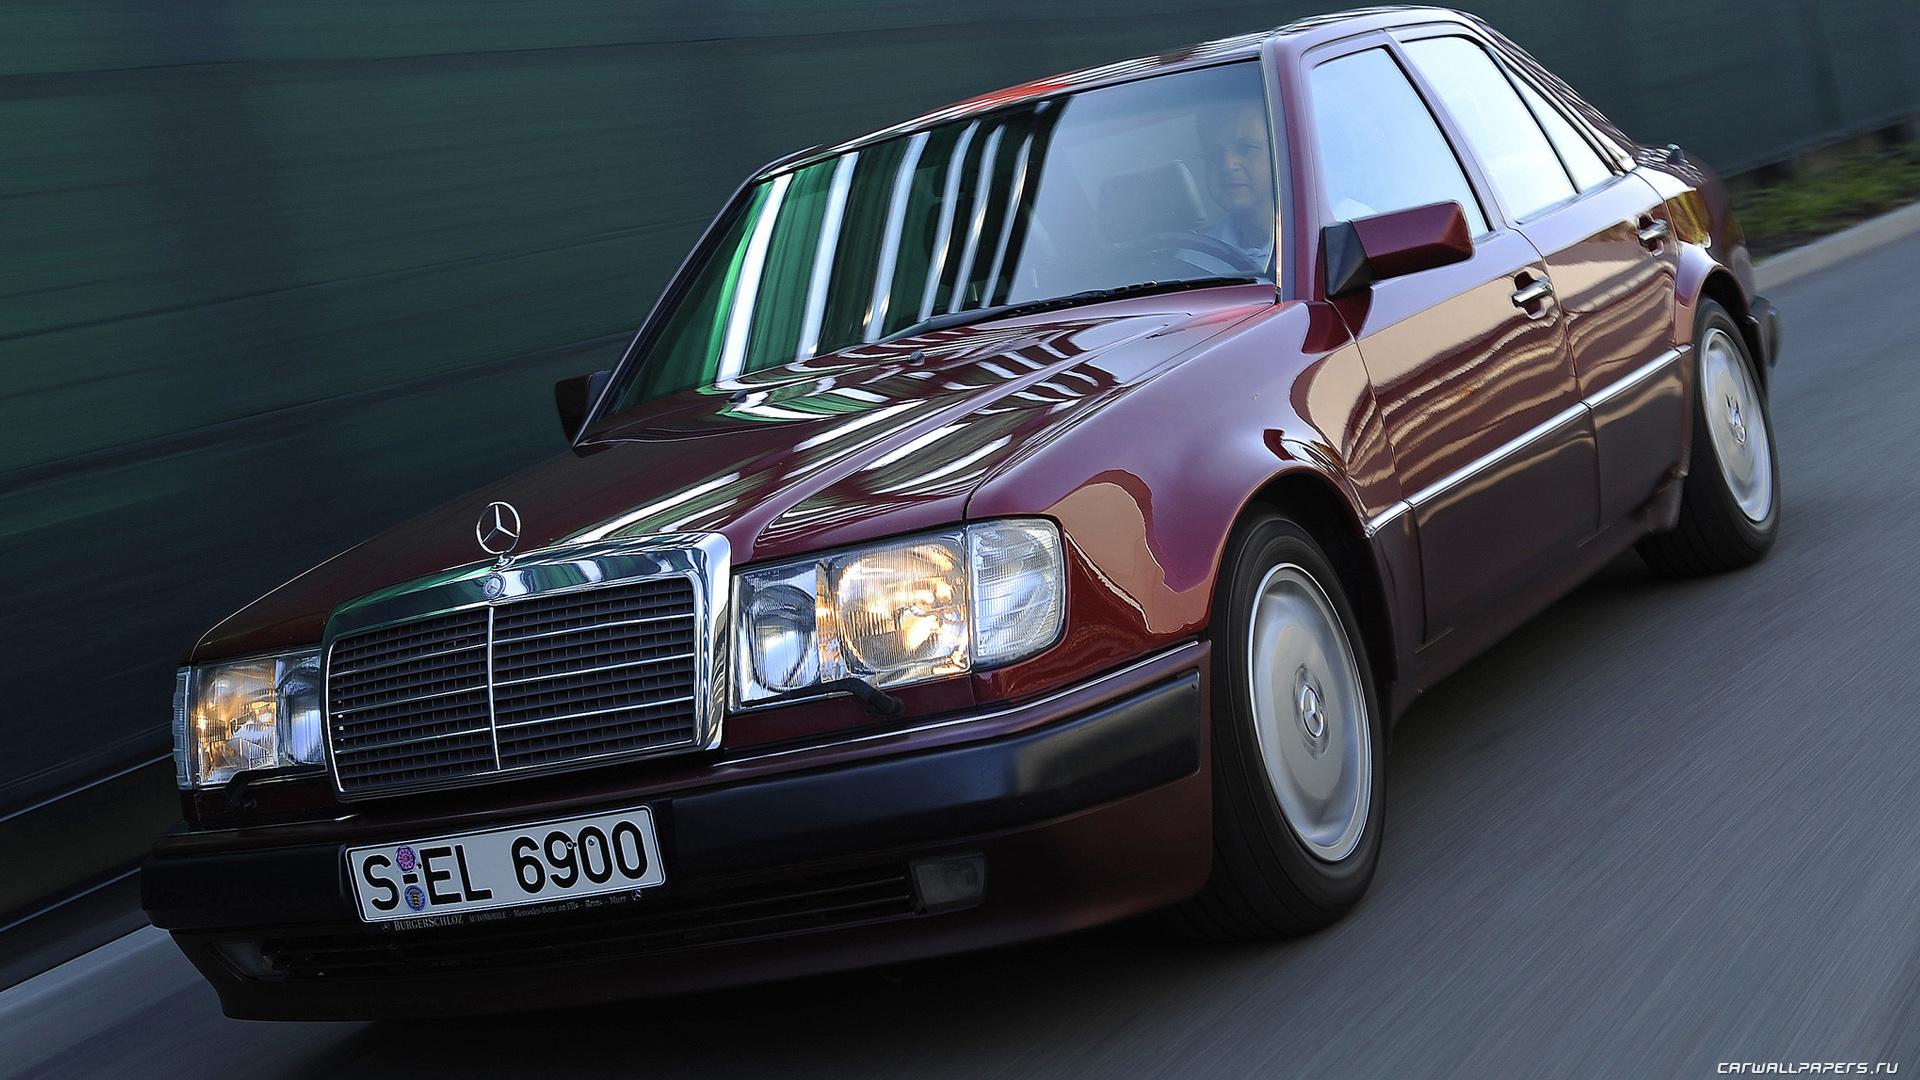 Cars desktop wallpapers Mercedes-Benz 500E W124 - 1991-1993